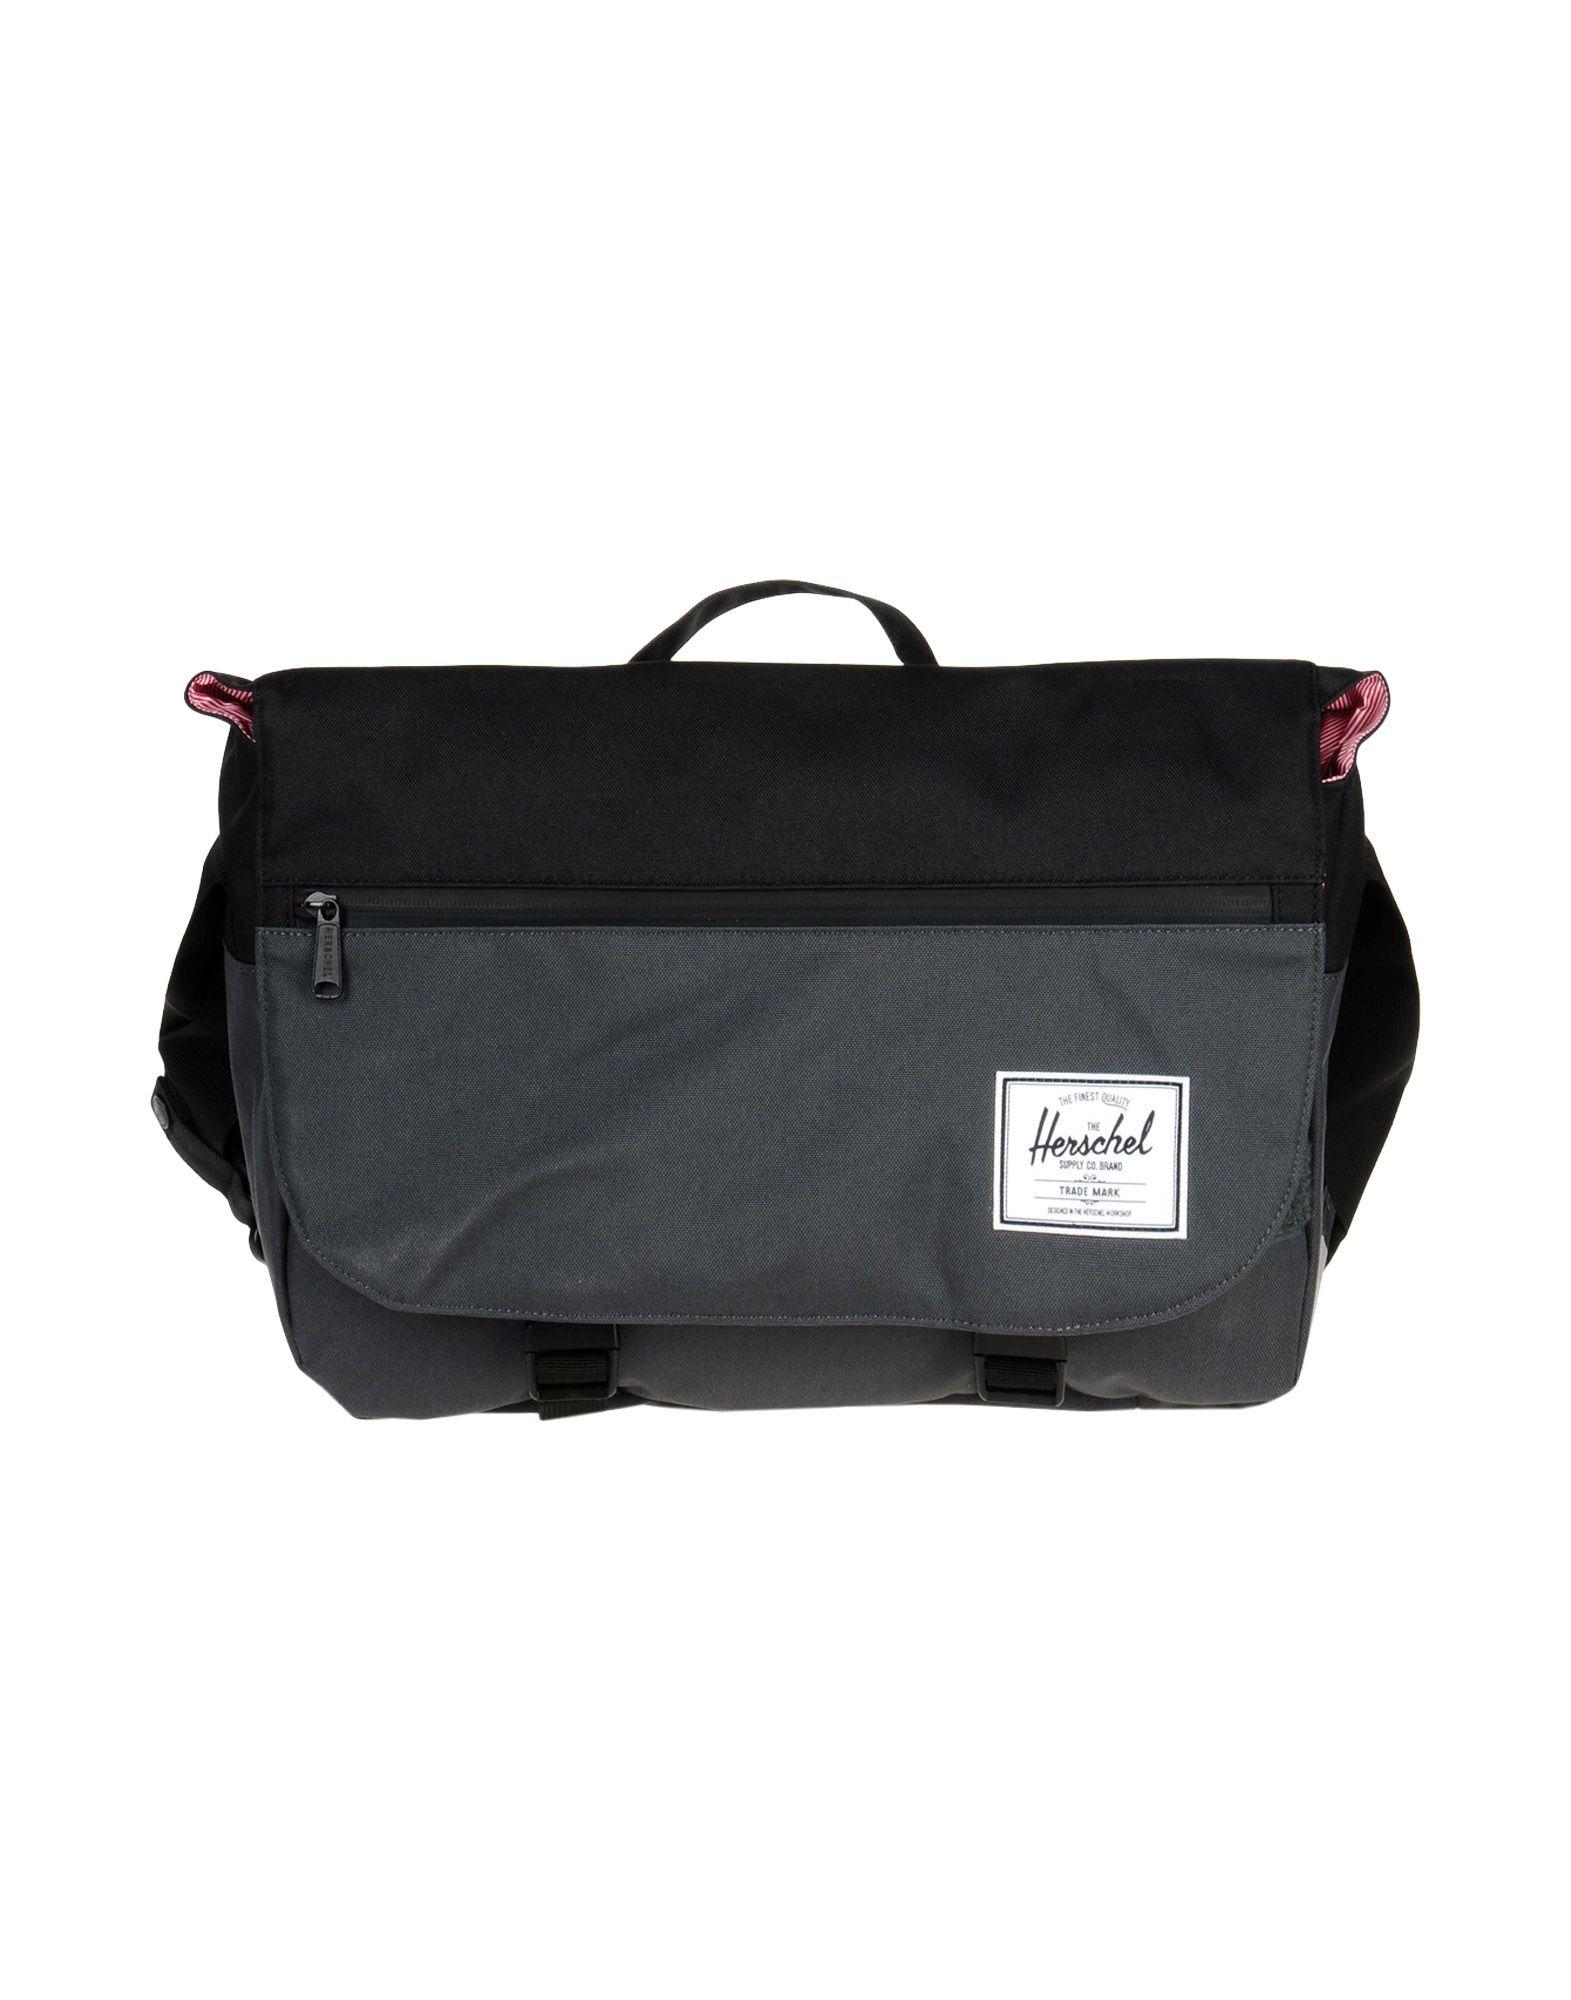 ФОТО herschel supply co. деловые сумки